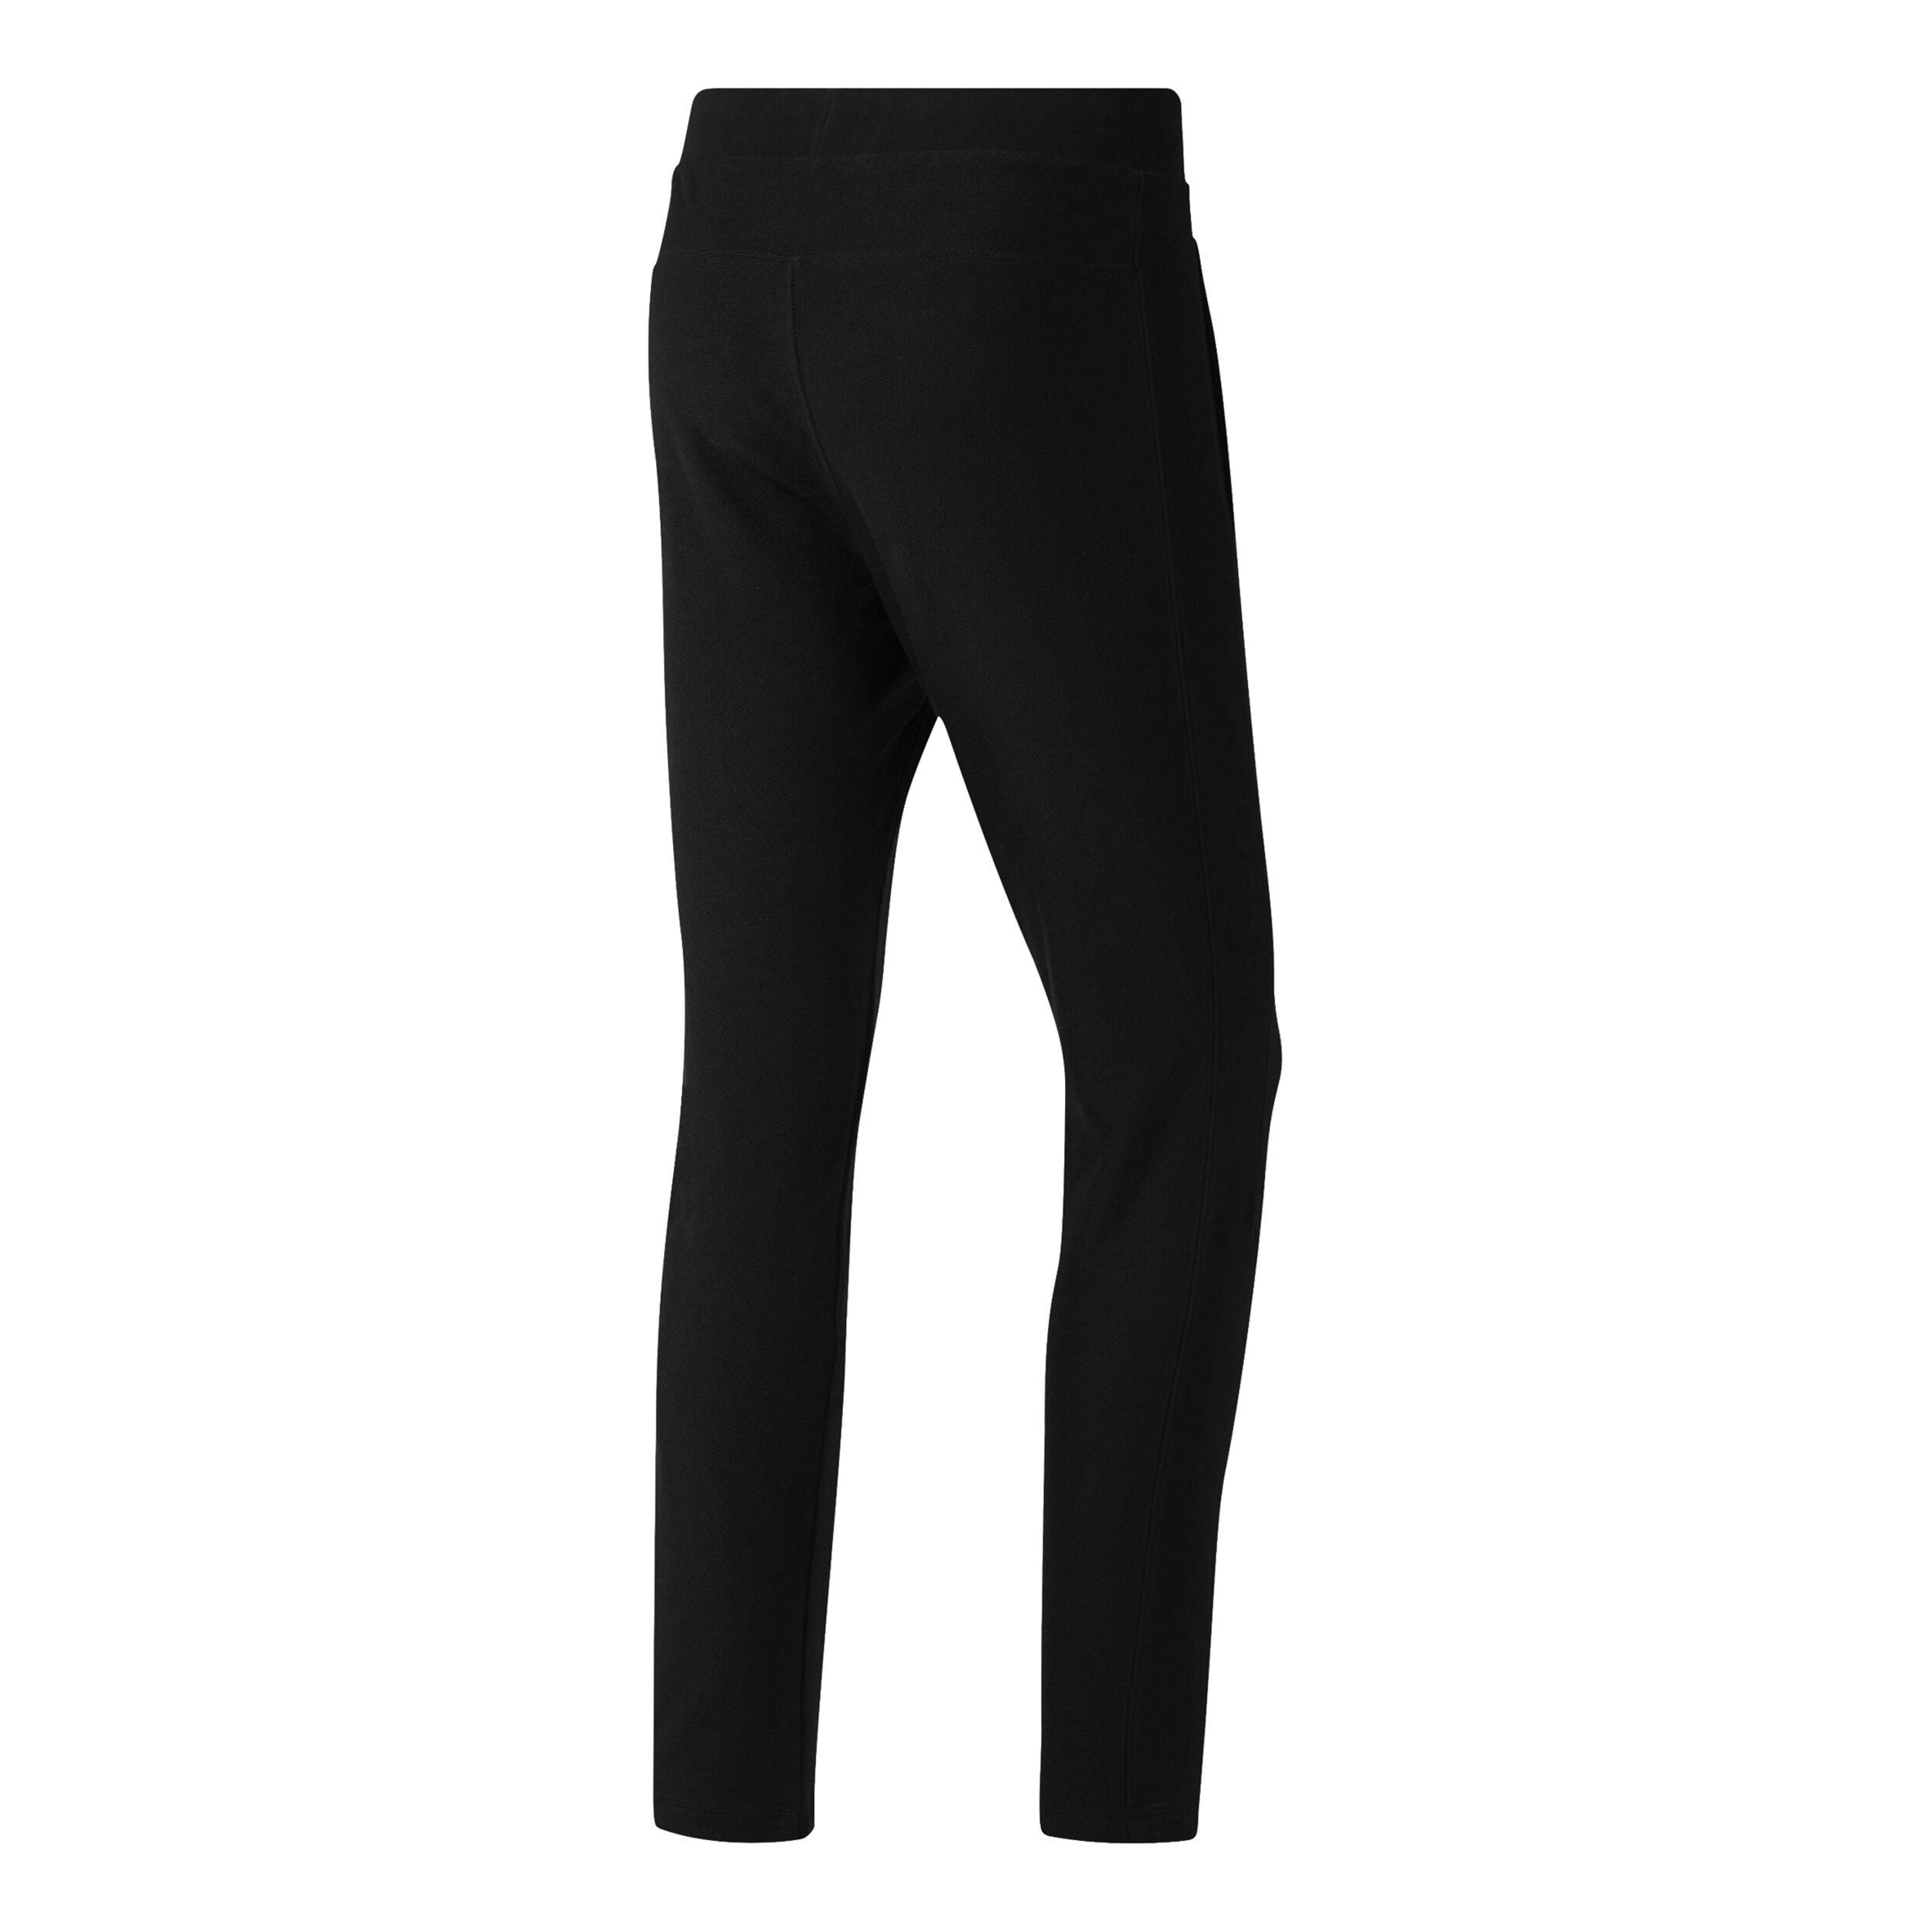 Reebok Men/'s Training Essentials Twill Shorts